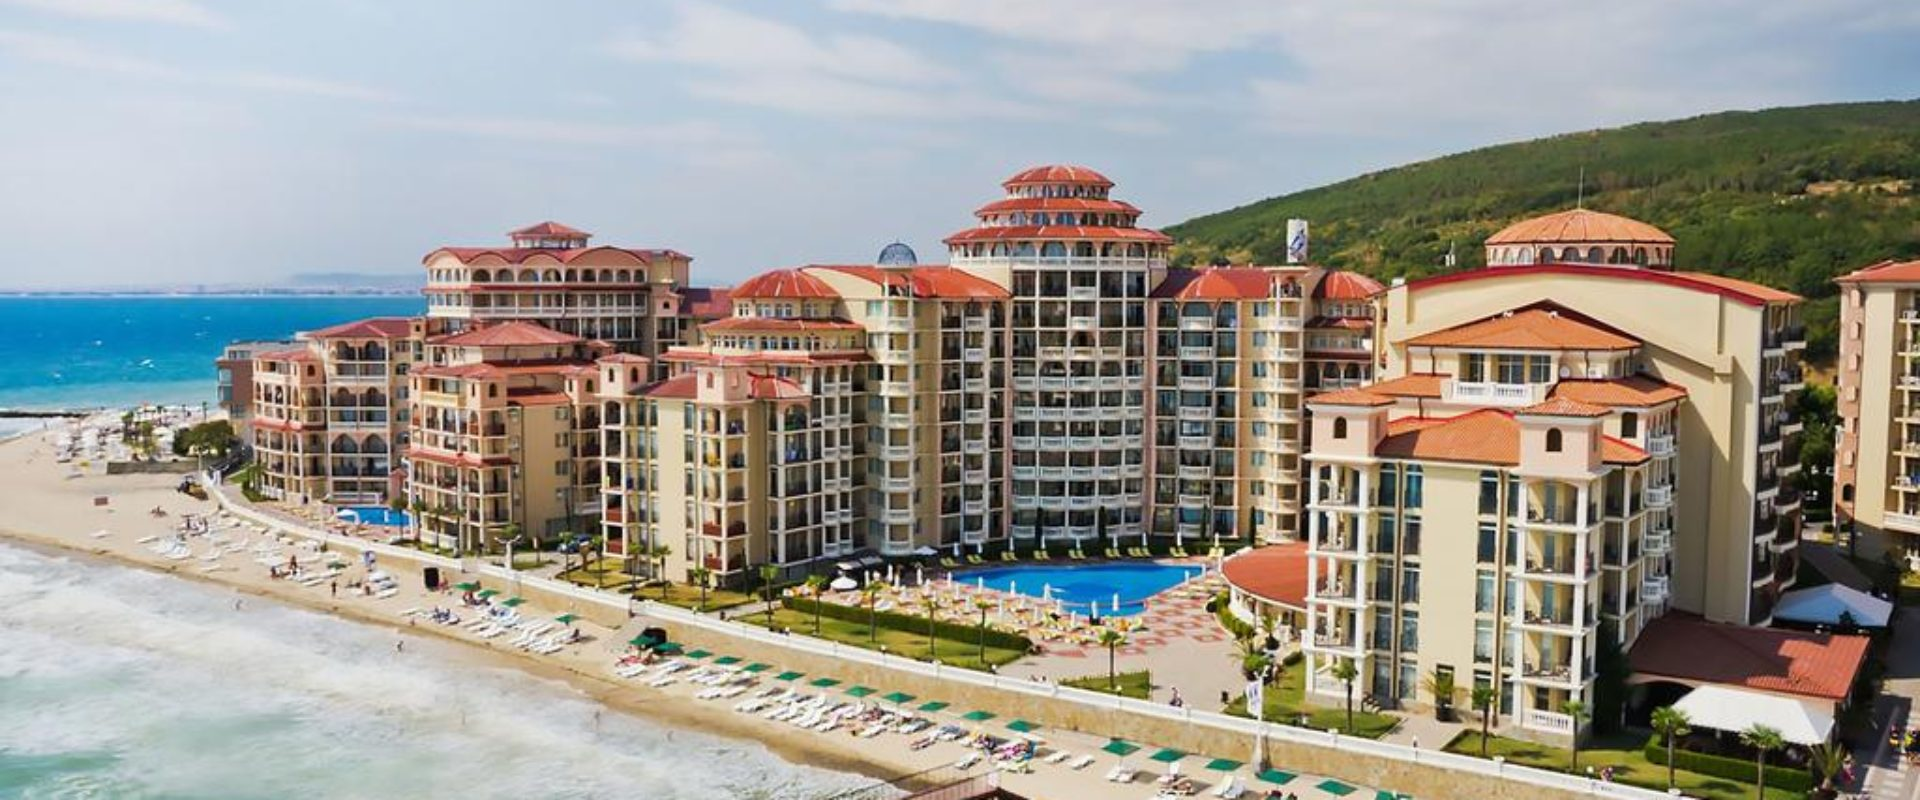 Odihnă la mare în Bulgaria 2020, Elenite, Hotel Andalusia Beach